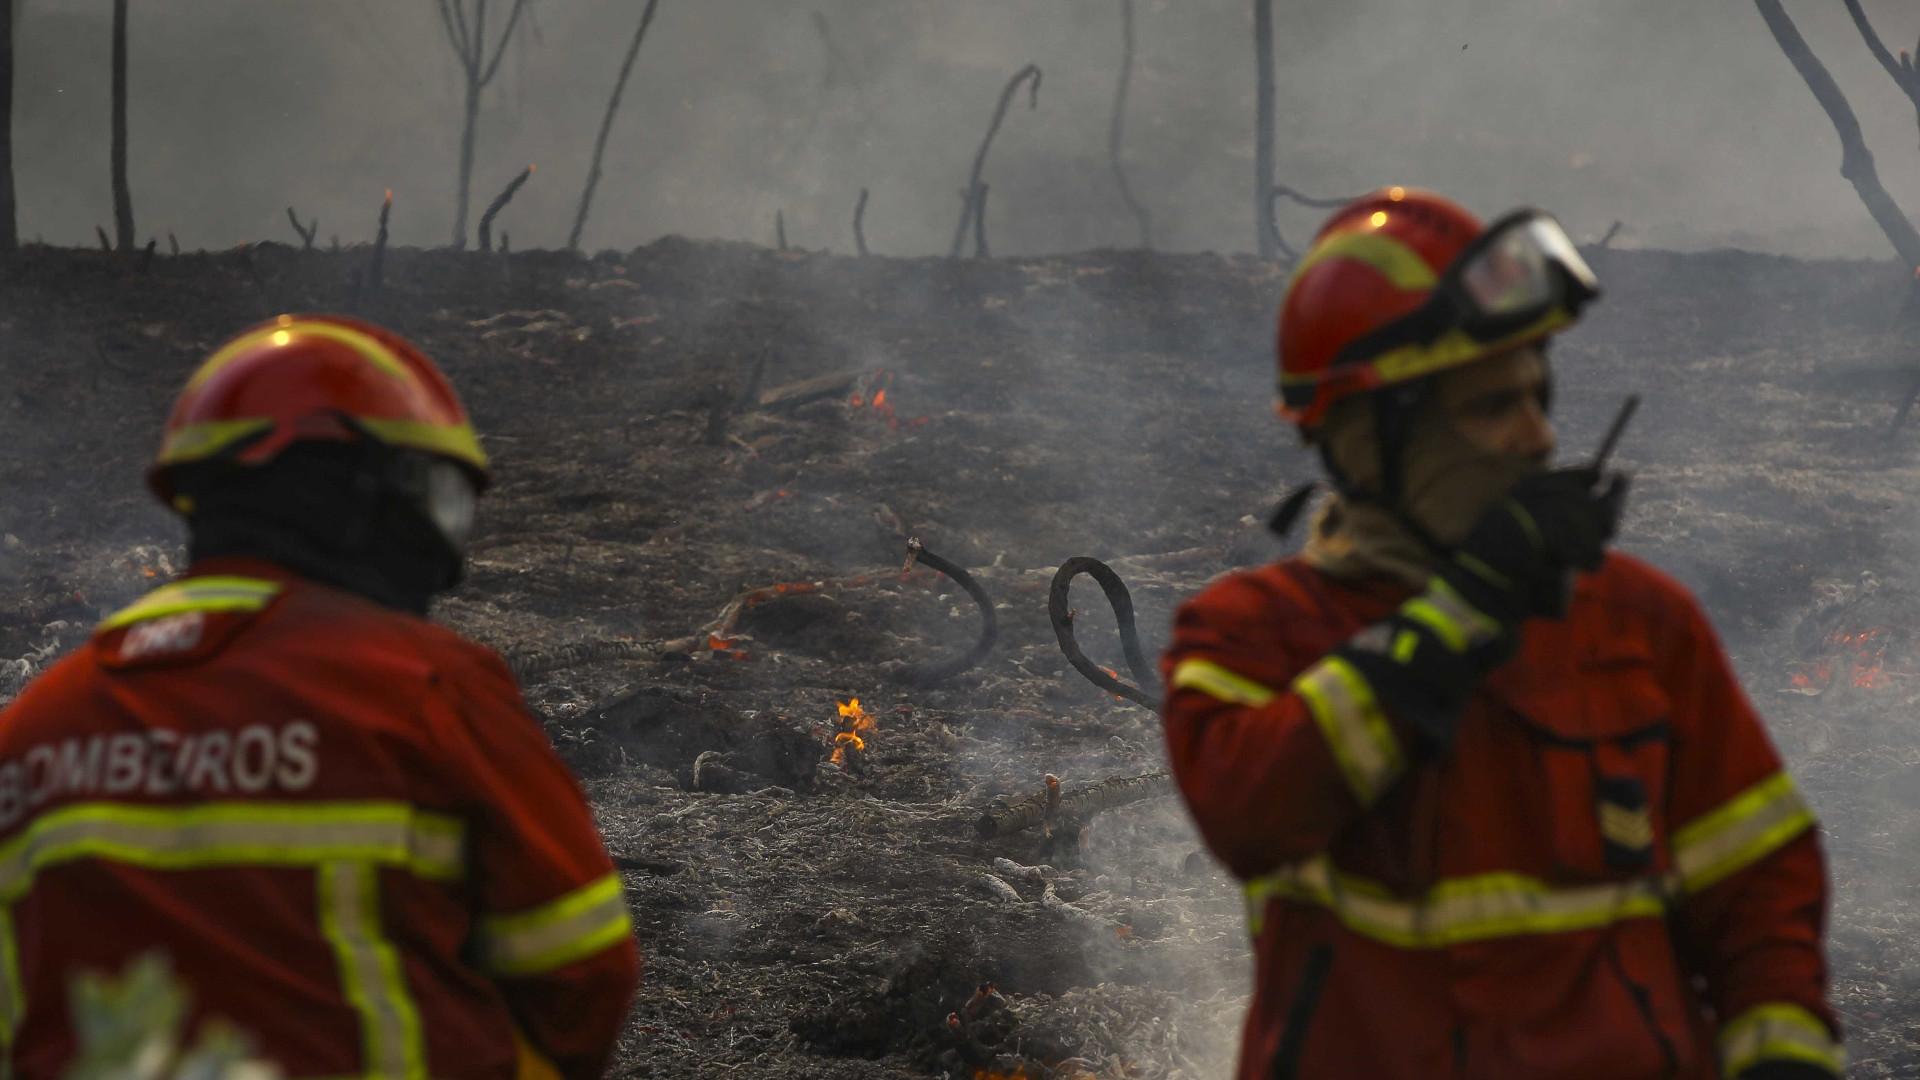 Iniciativa empresarial leva 850 voluntários a reflorestar áreas ardidas